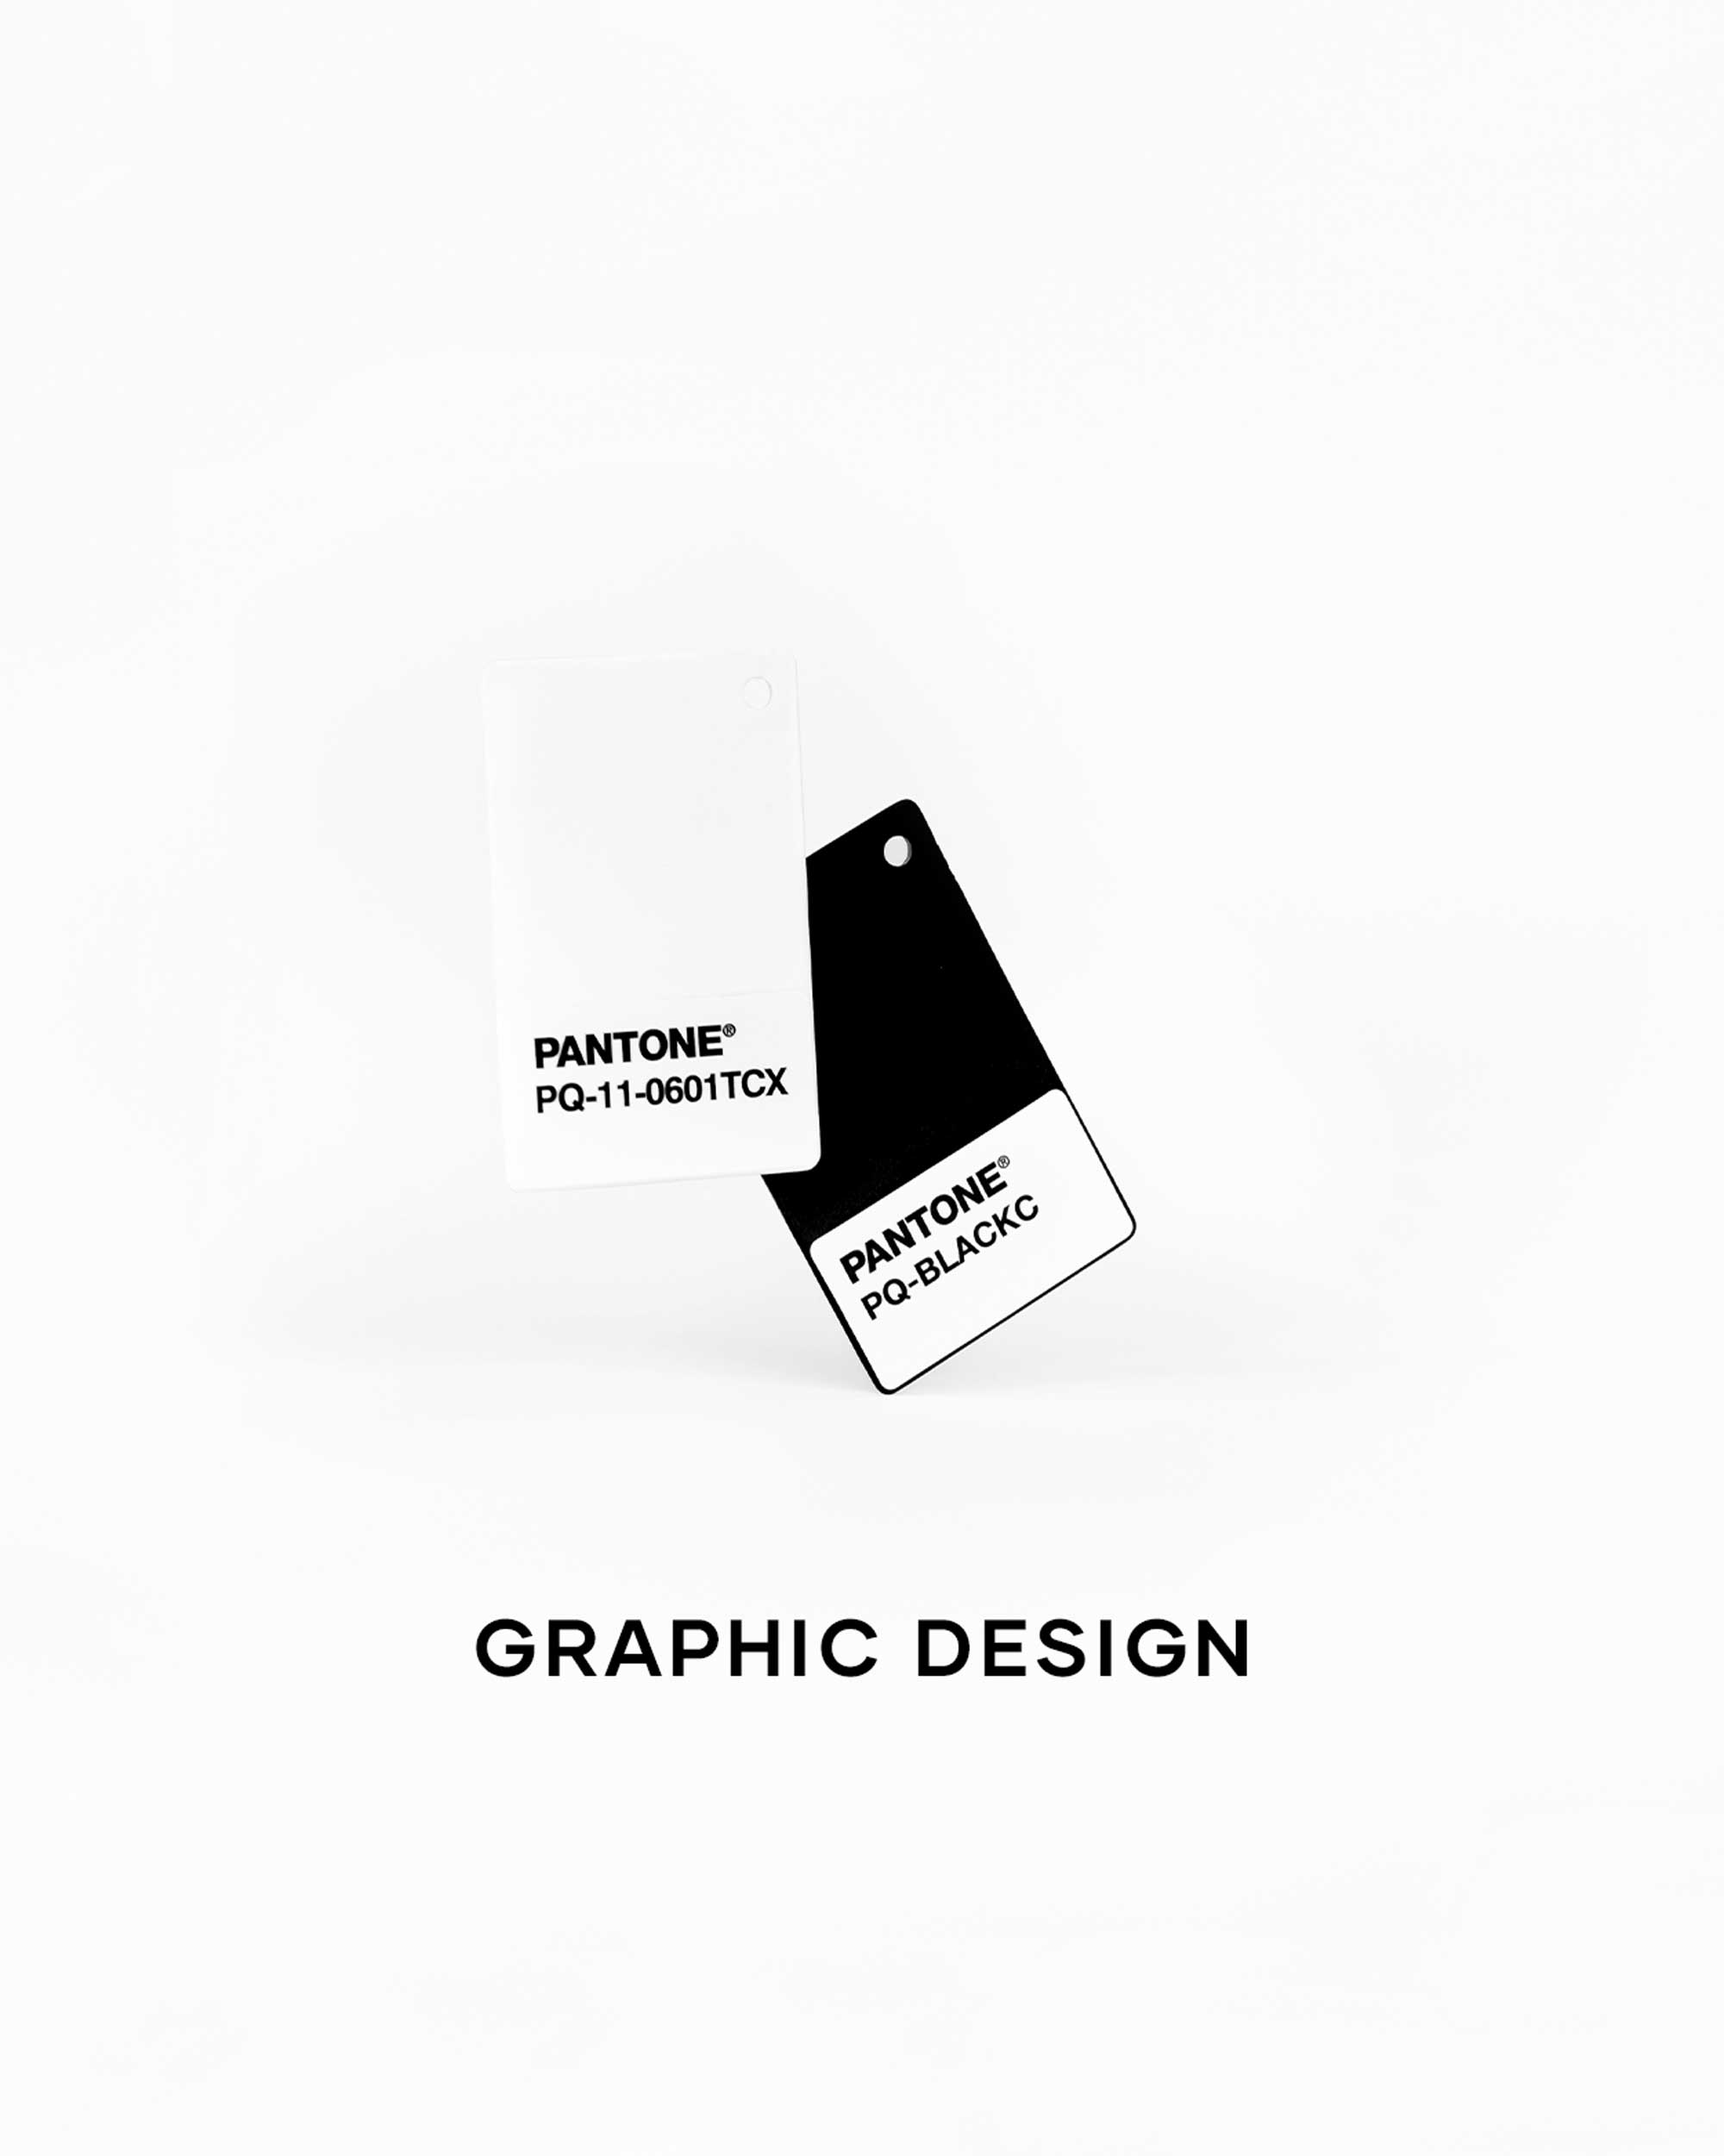 services-april-ford-Graphic-Design.jpg